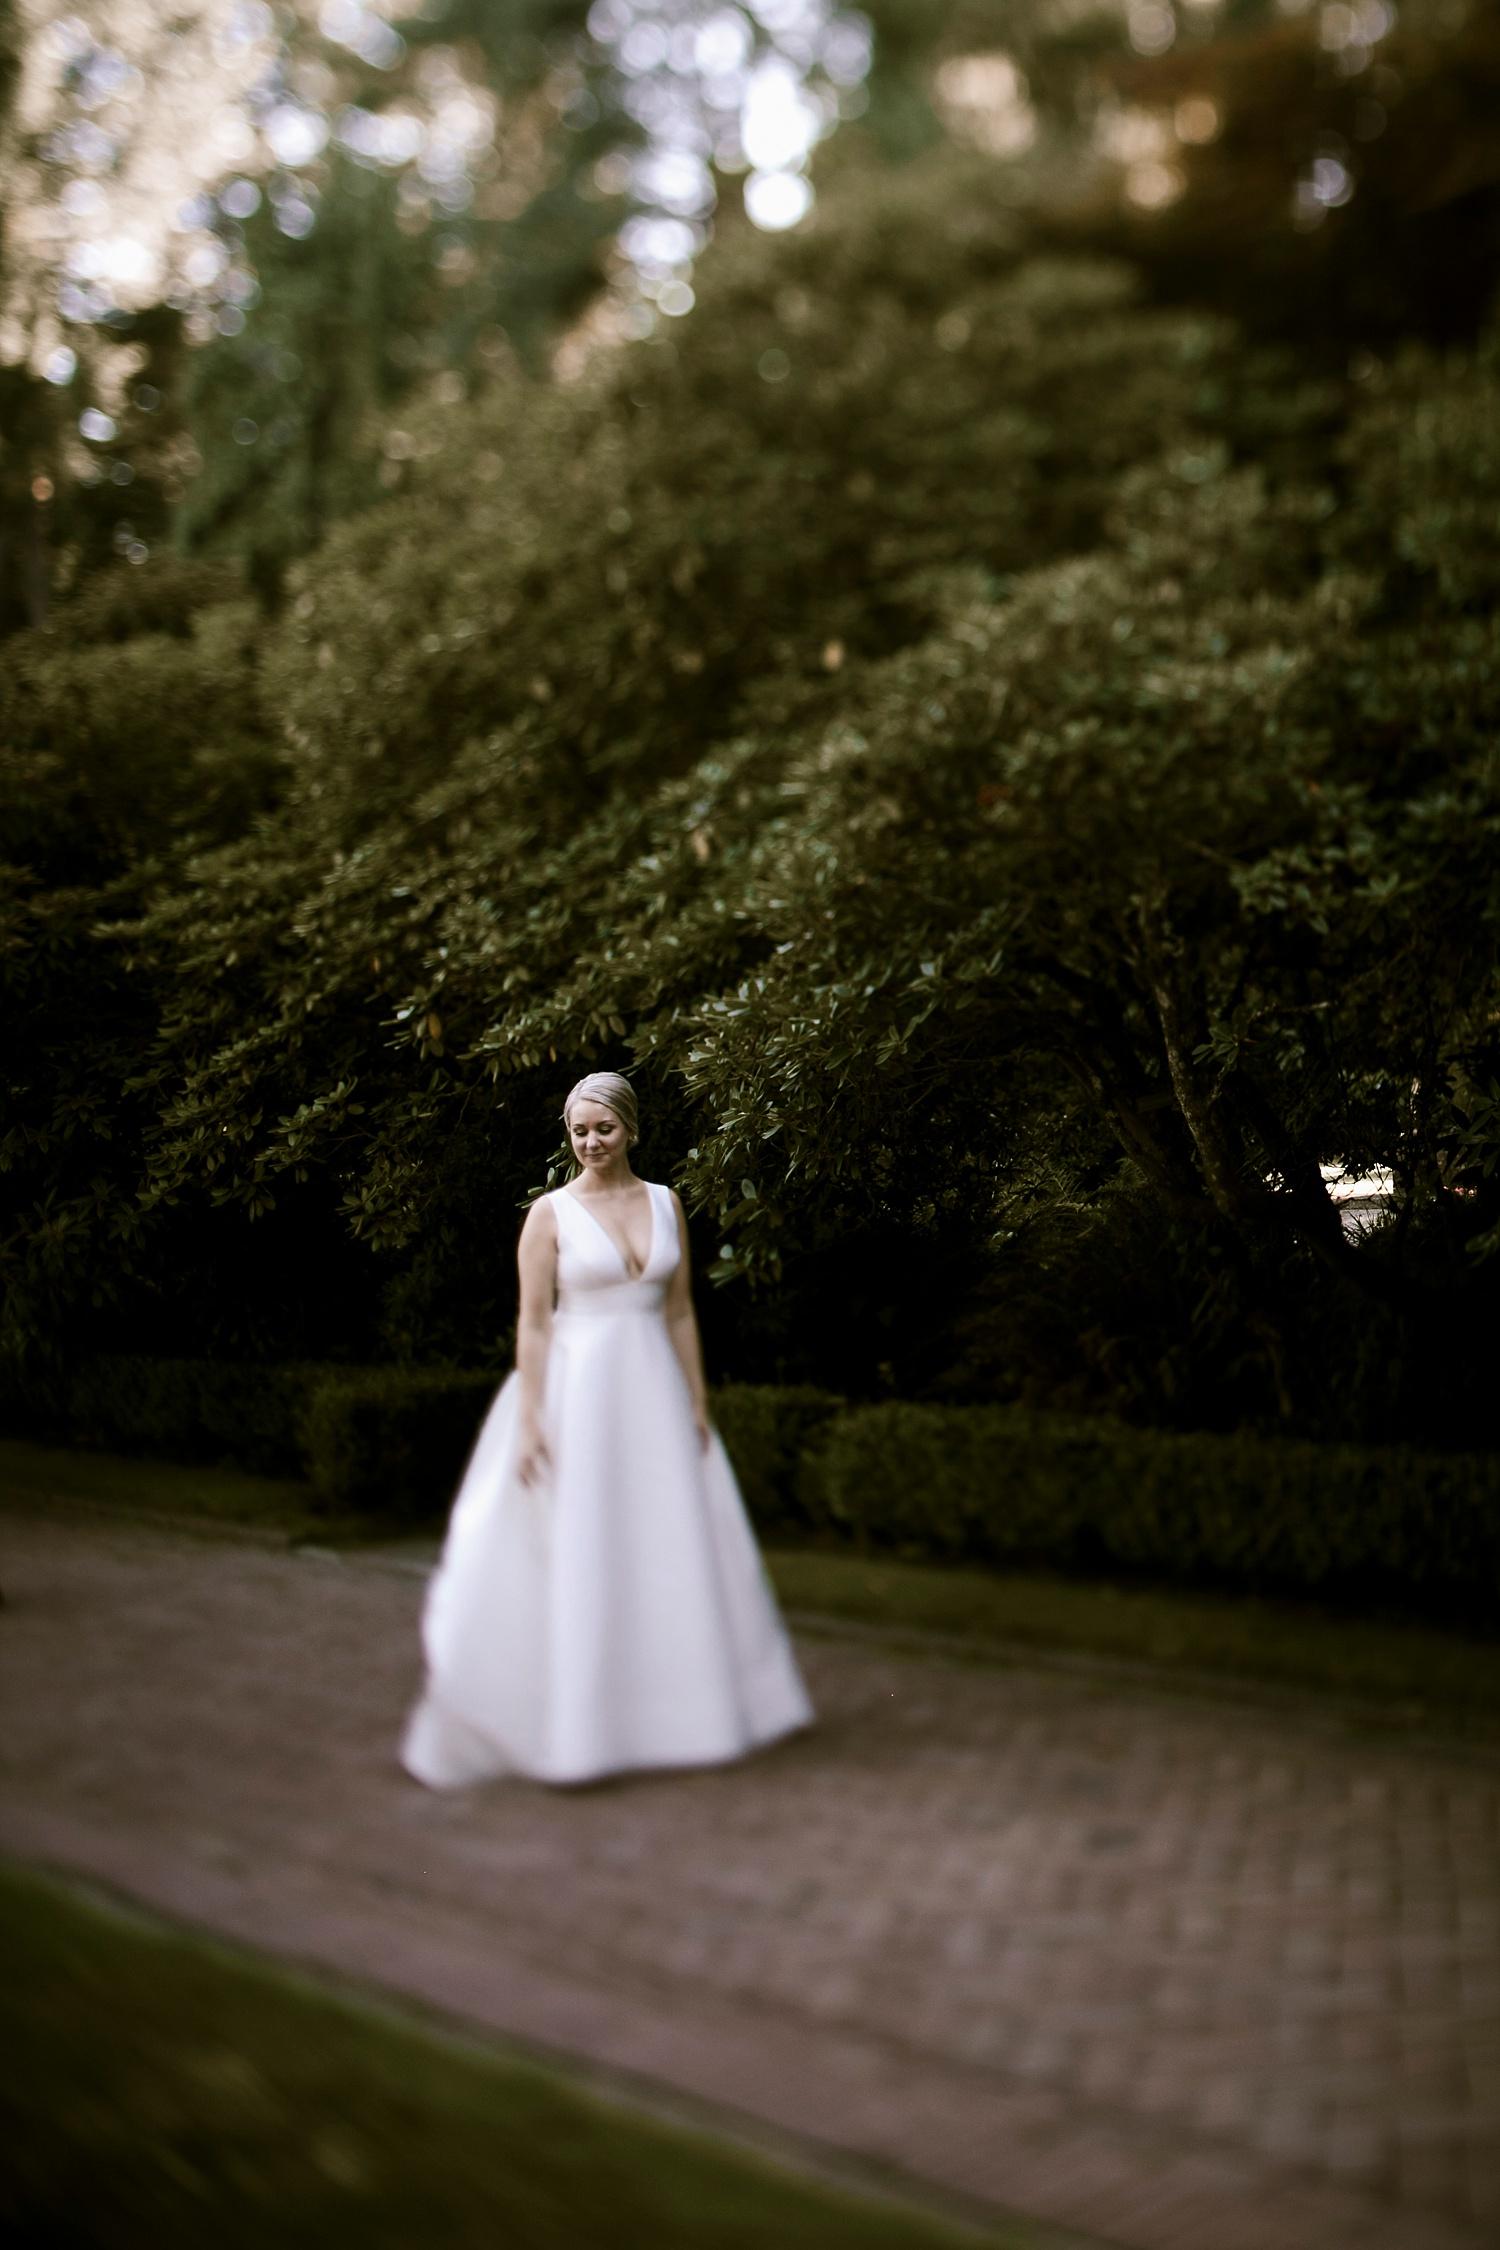 san francisco wedding photographer_049.JPG